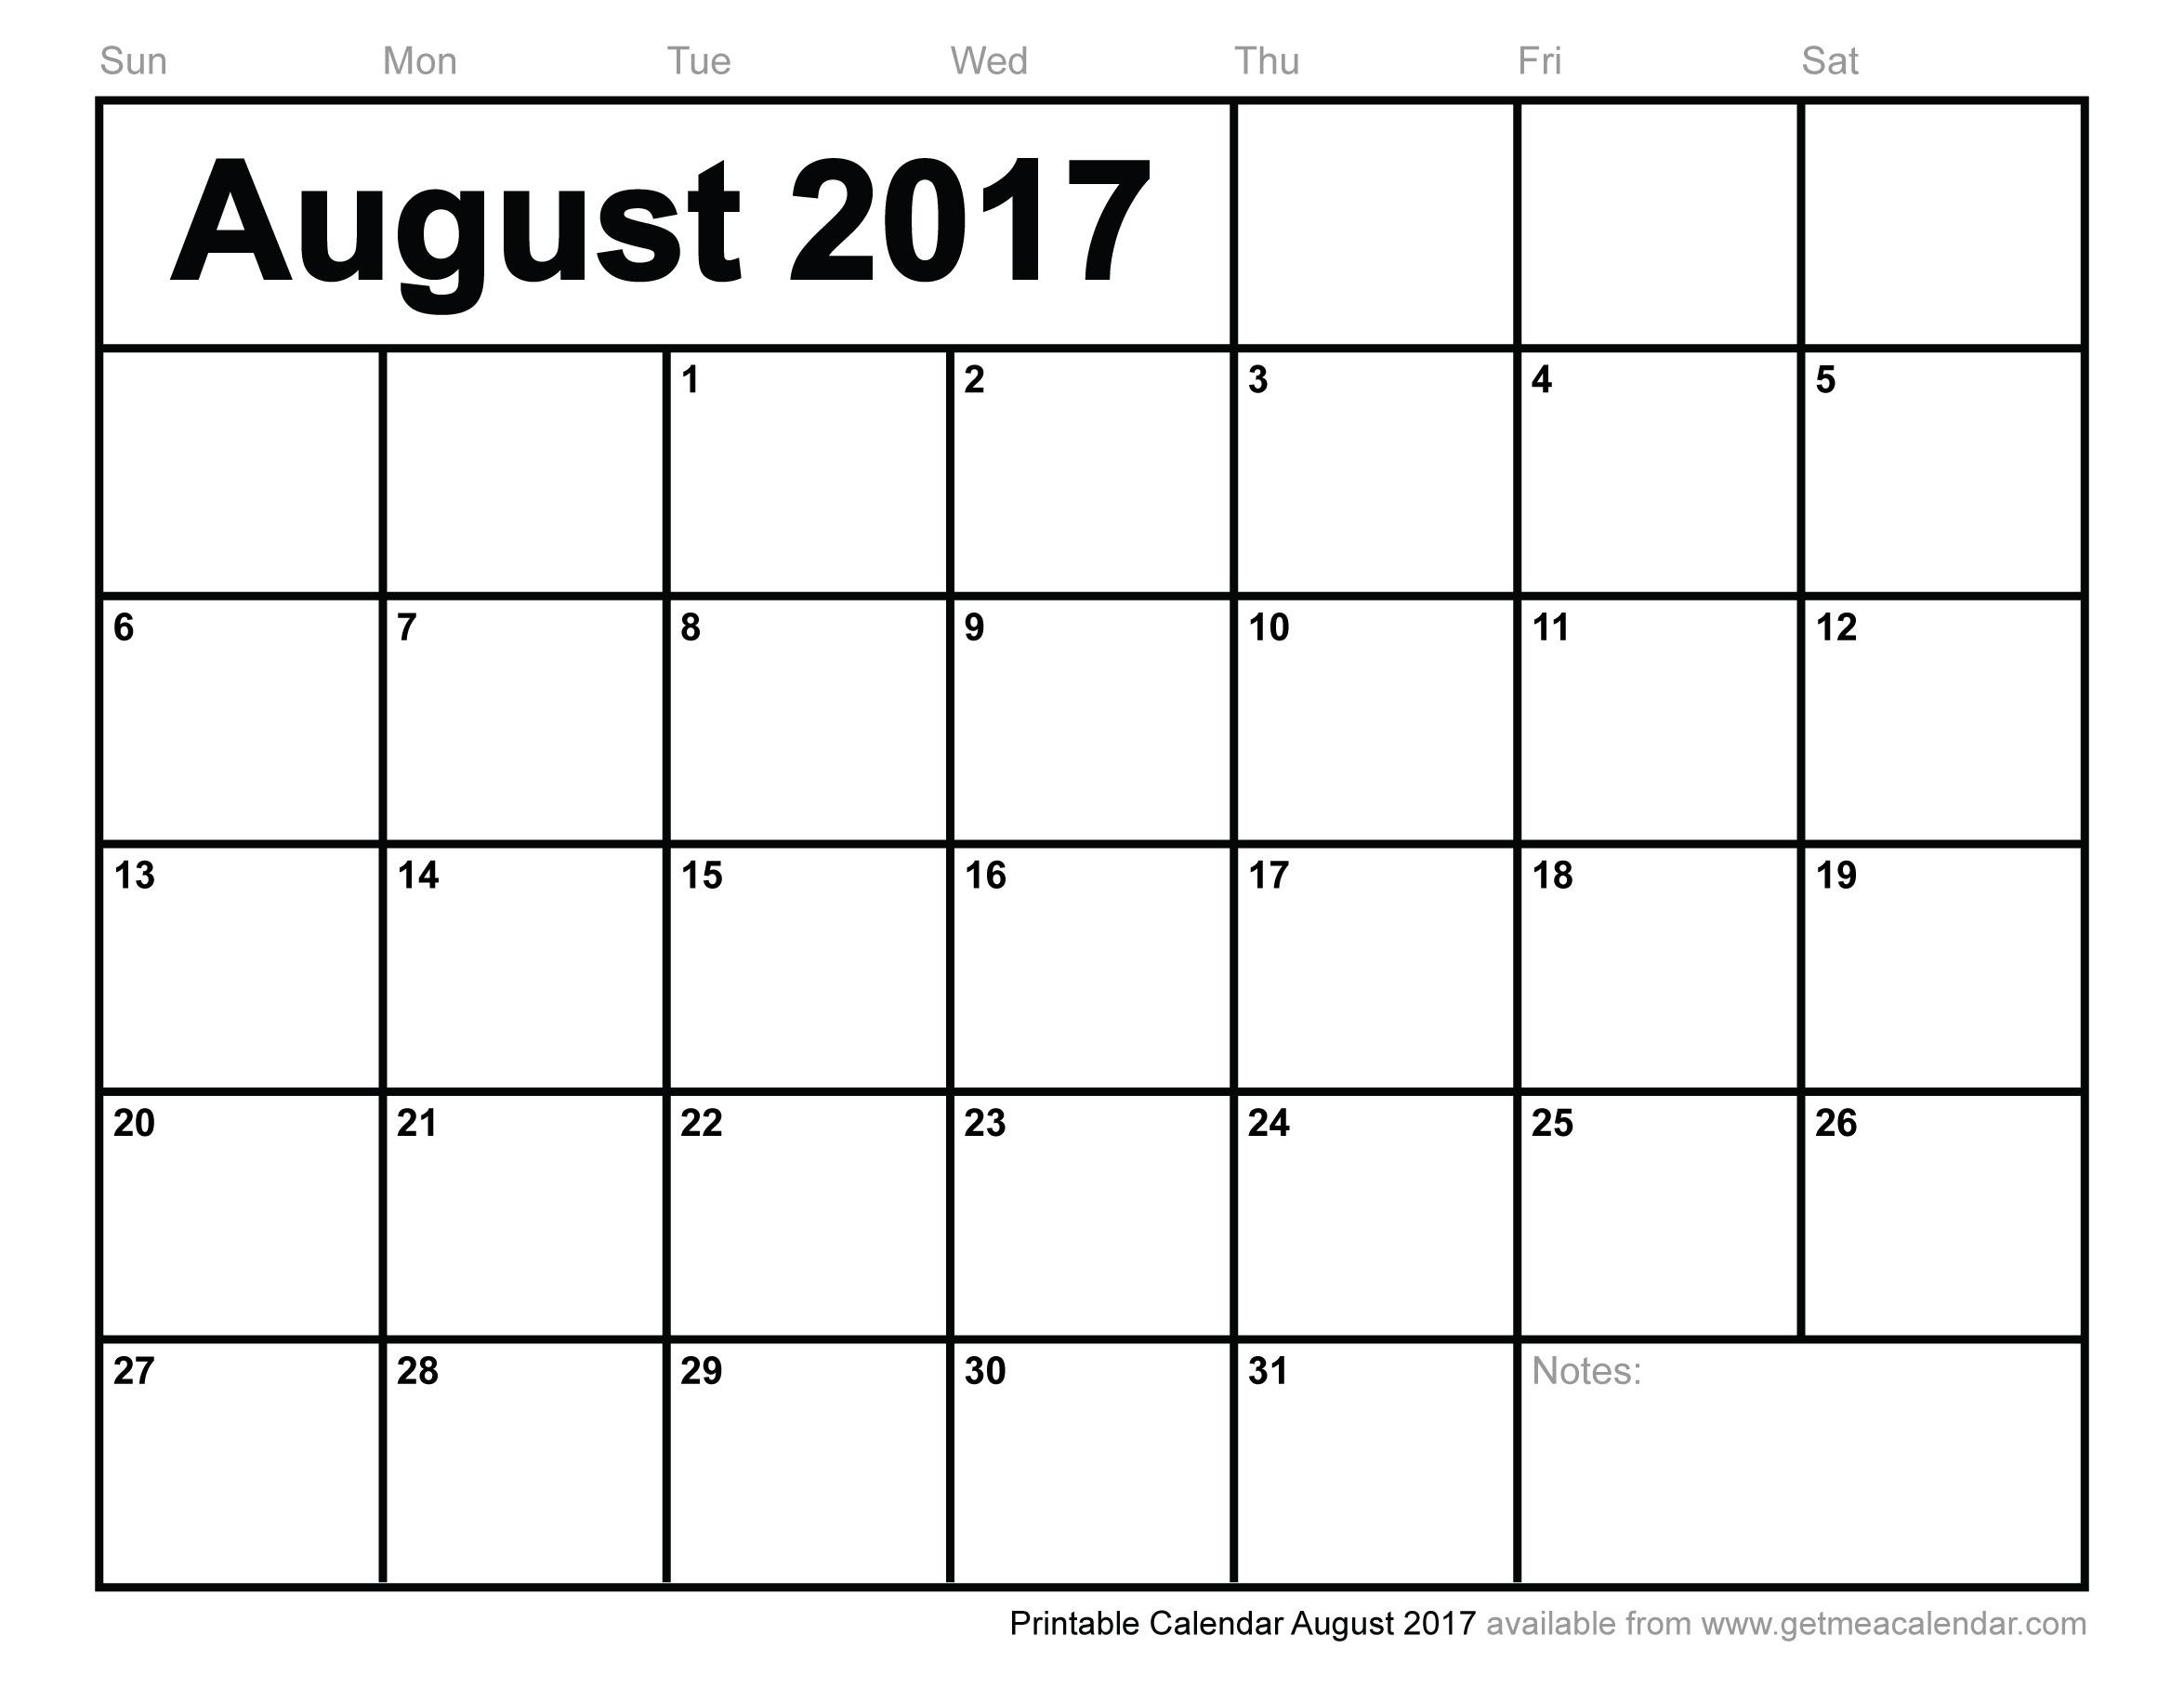 Printable Calendar August 2017 - Free Printable August 2017